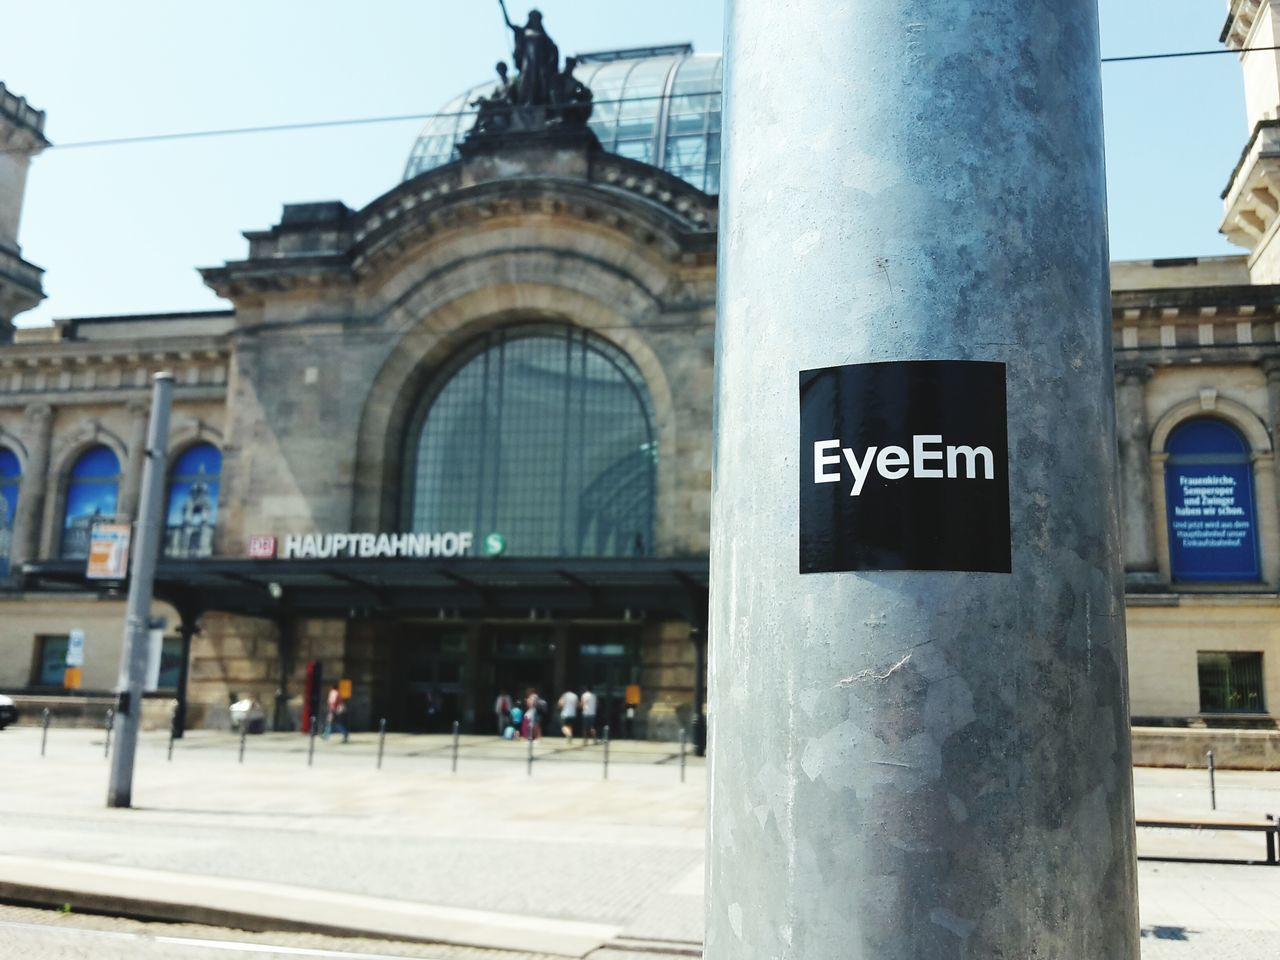 Let the Adventure begin! EEA3 EEA3 - Dresden Dresden Dresden♡ The Street Photographer - 2015 EyeEm Awards The Traveler - 2015 EyeEm Awards The Architect - 2015 EyeEm Awards